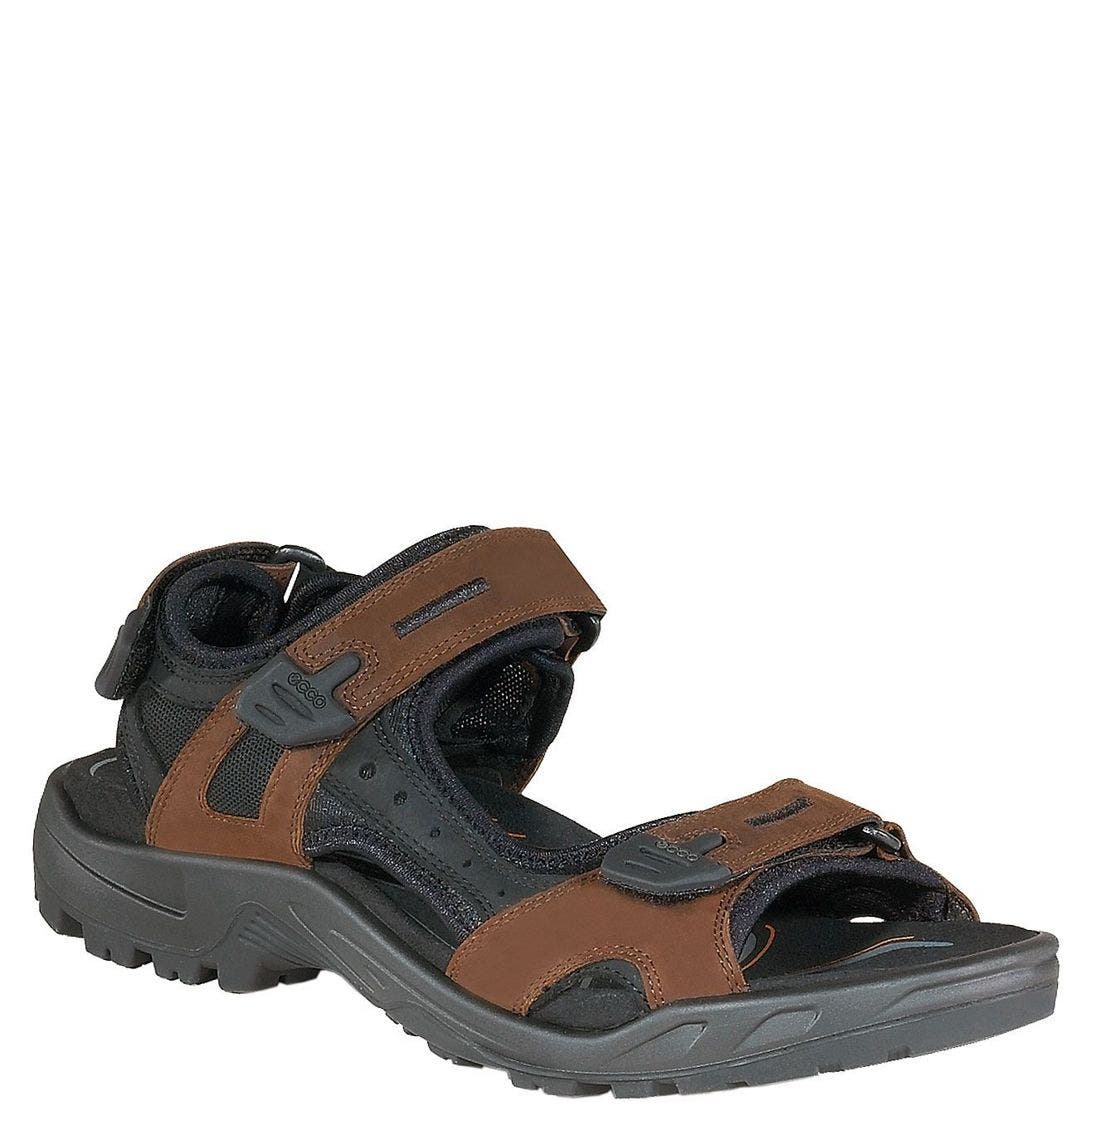 'Yucatan' Sandal,                             Main thumbnail 1, color,                             BROWN/BLACK